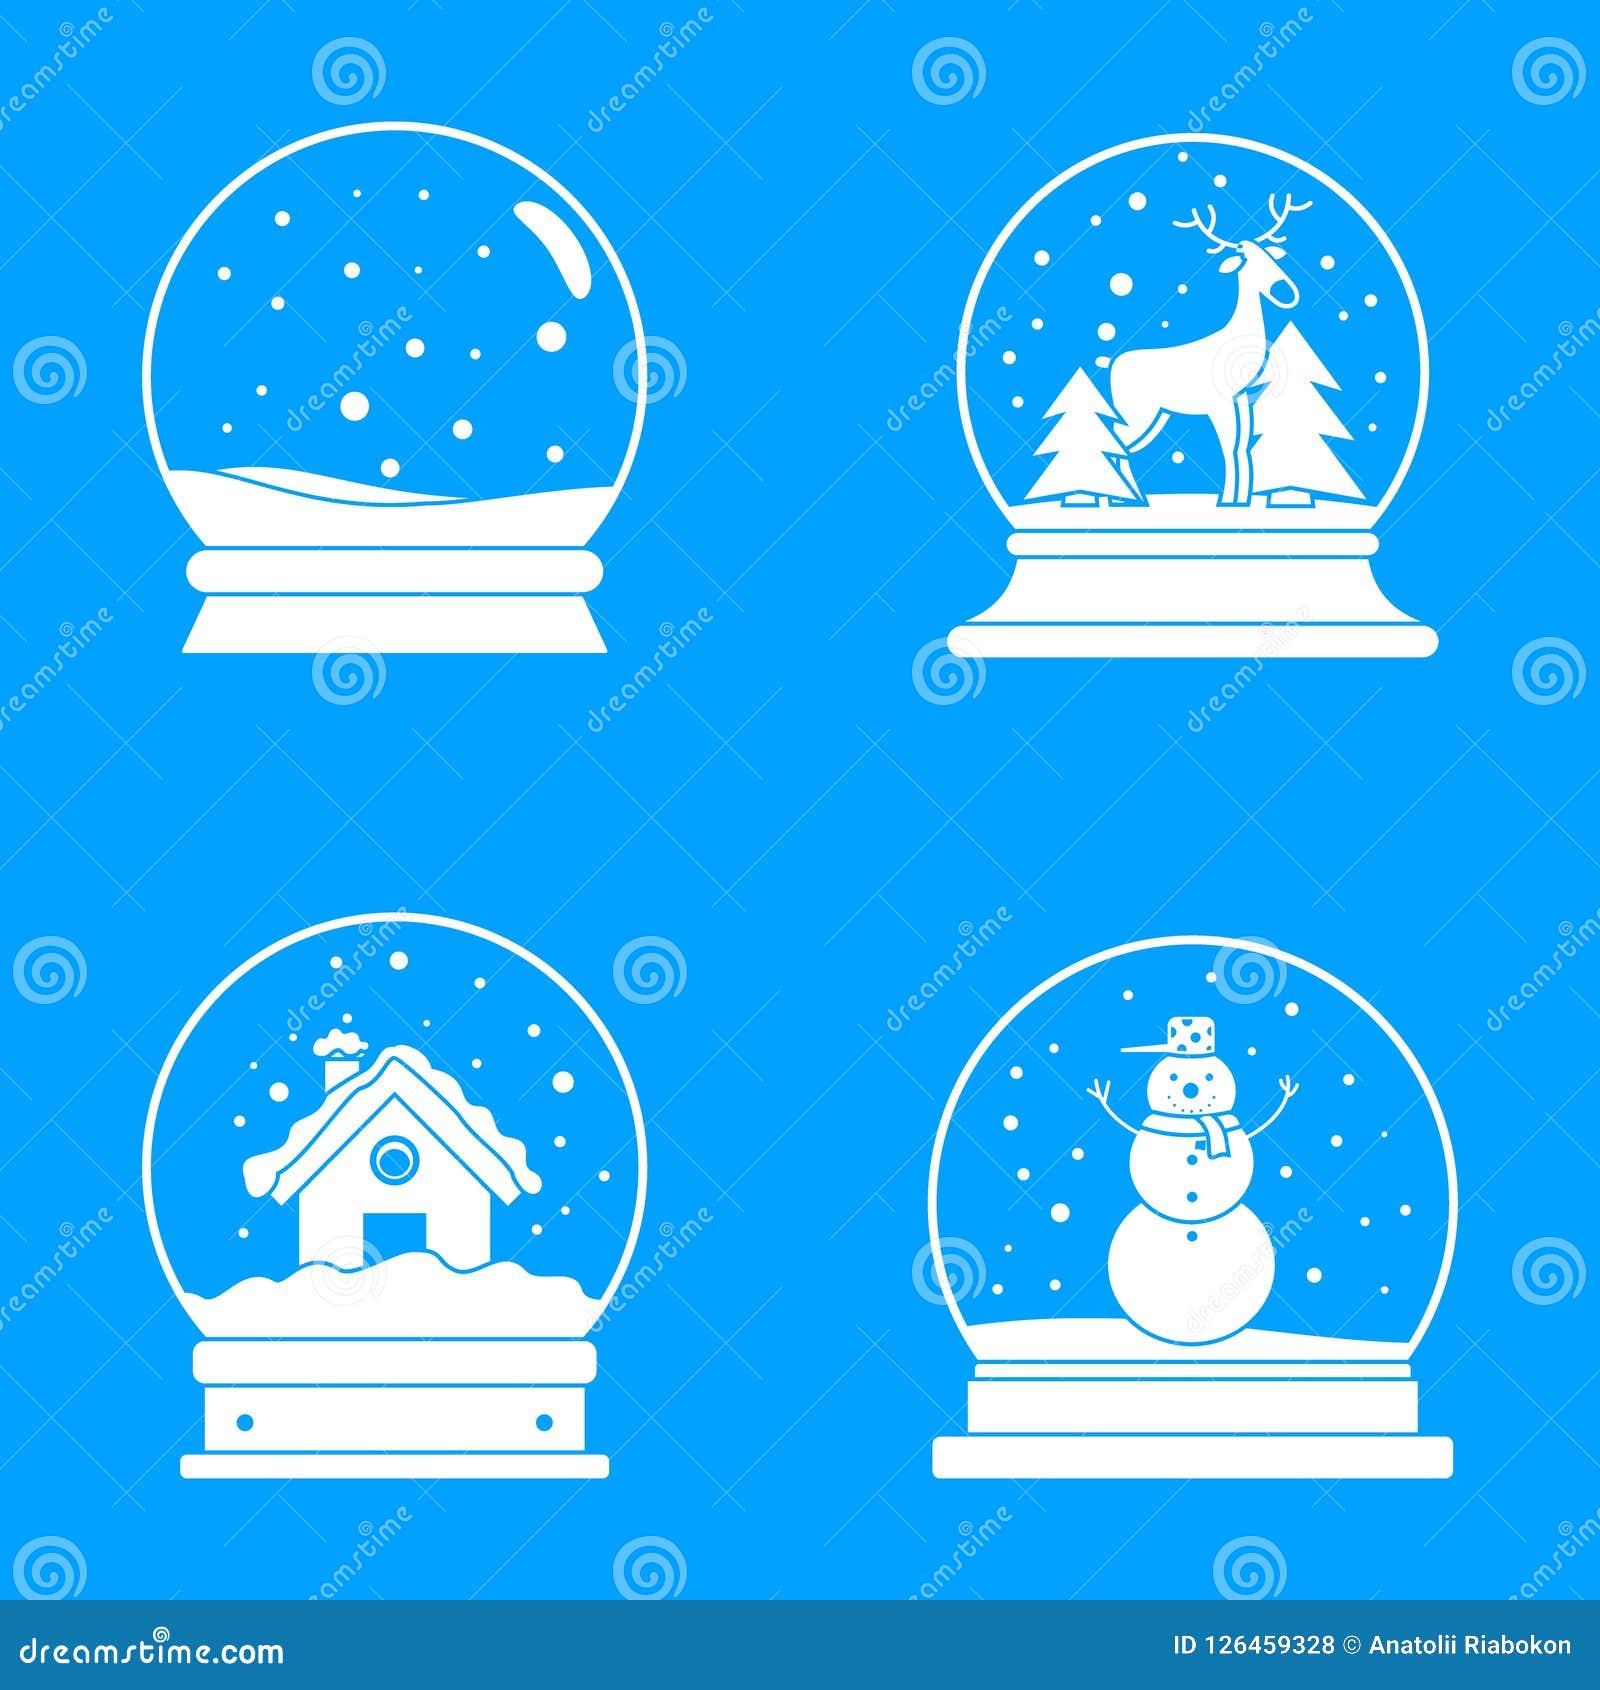 Snow globe ball christmas icons set, simple style